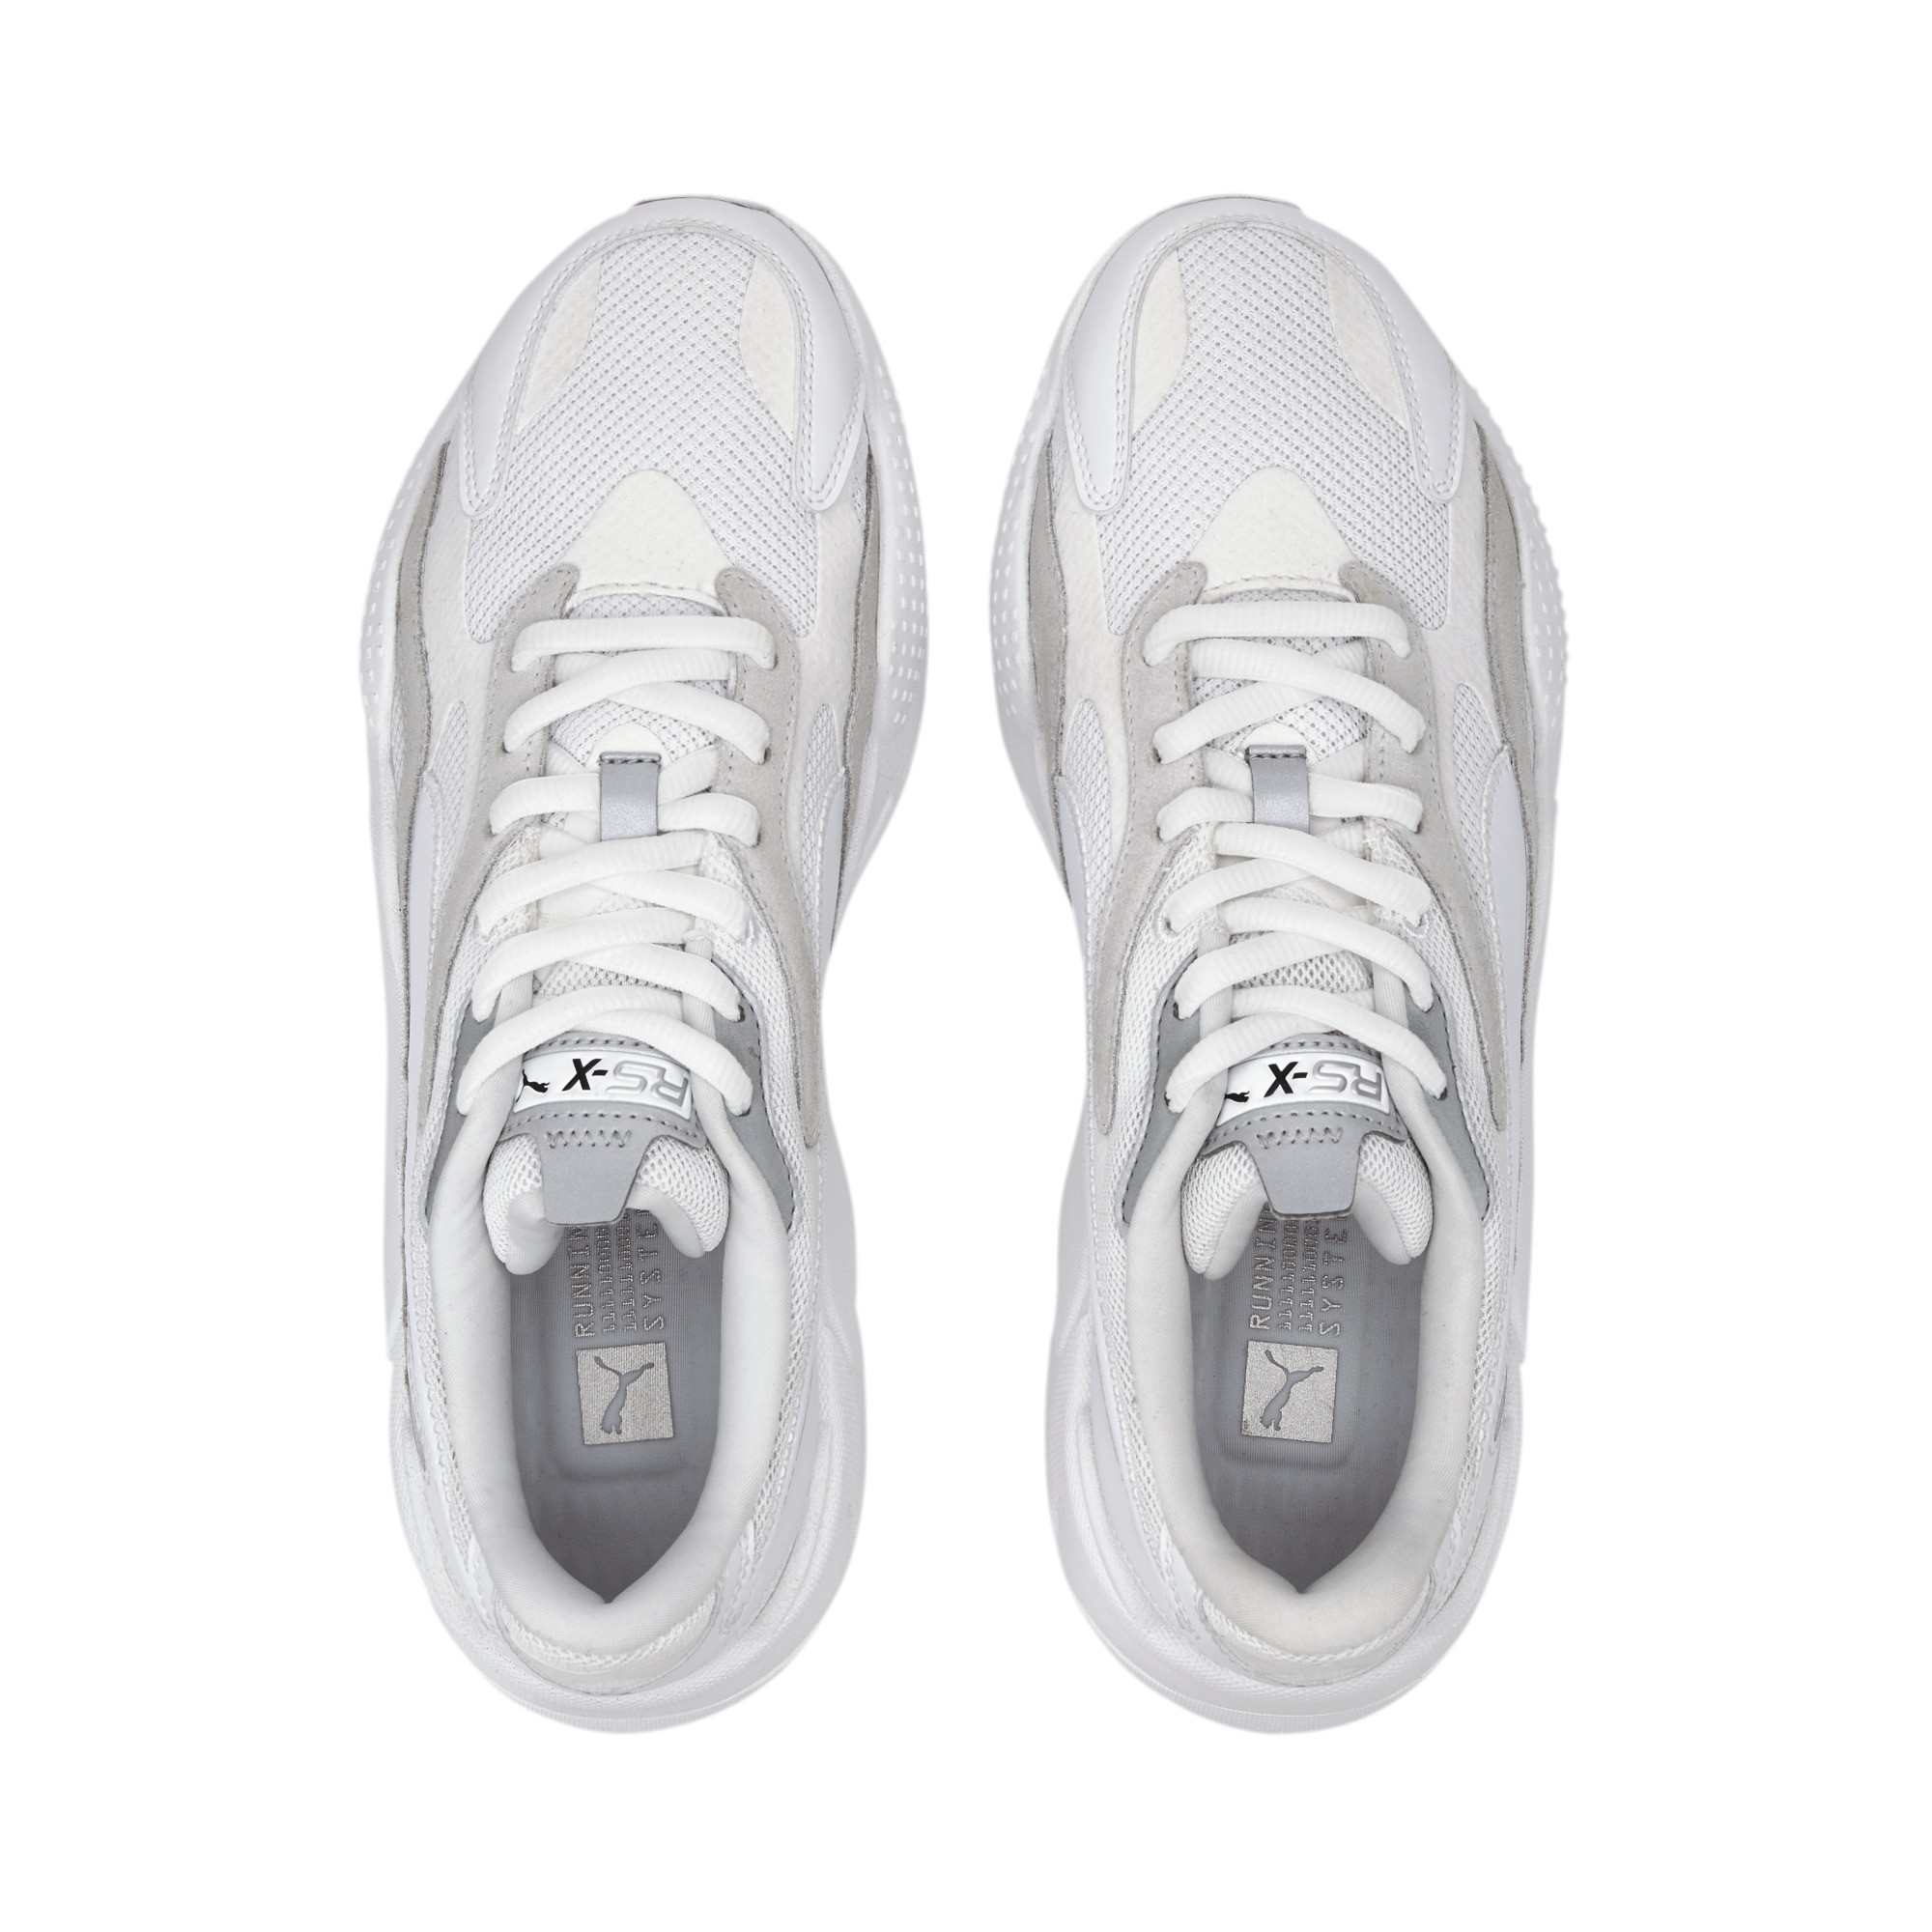 PUMA-Men-039-s-RS-X-Puzzle-Sneakers thumbnail 21